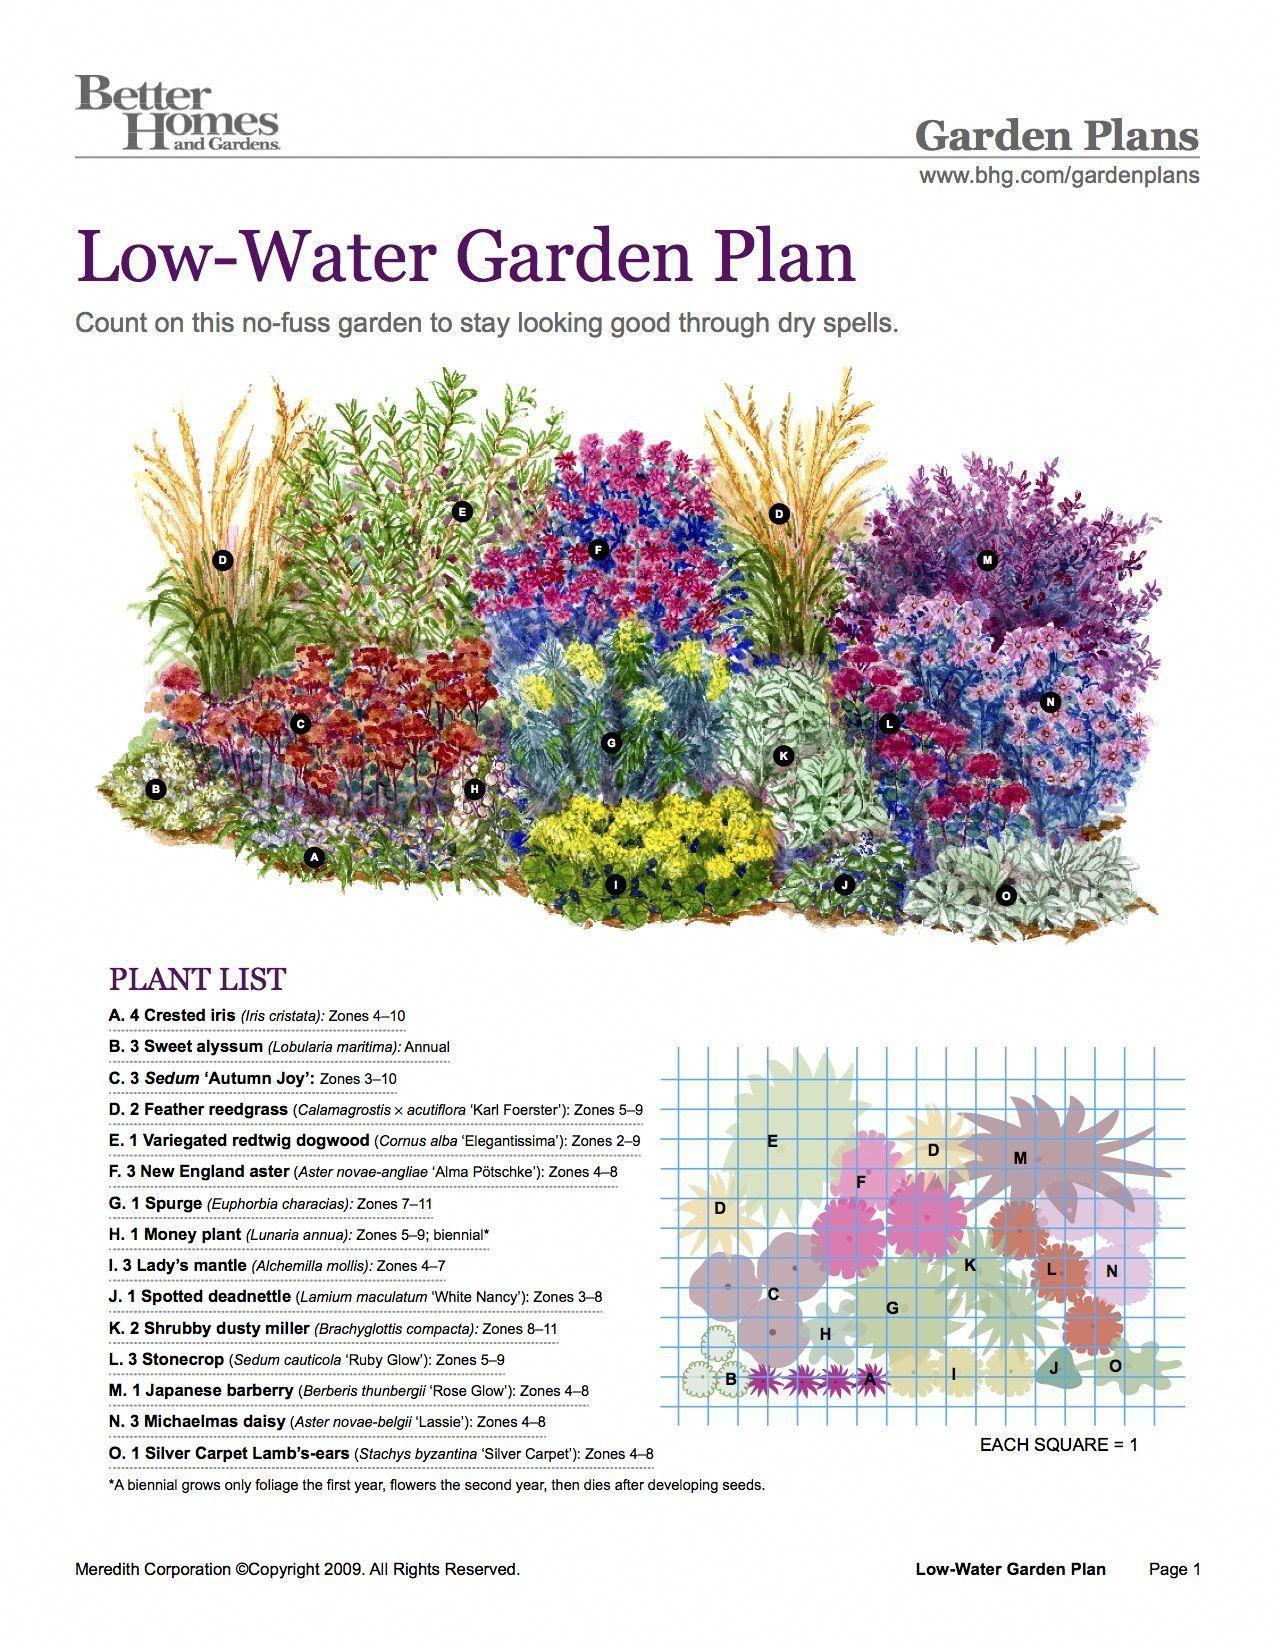 Bhg lowwater garden plan lowwaterplants